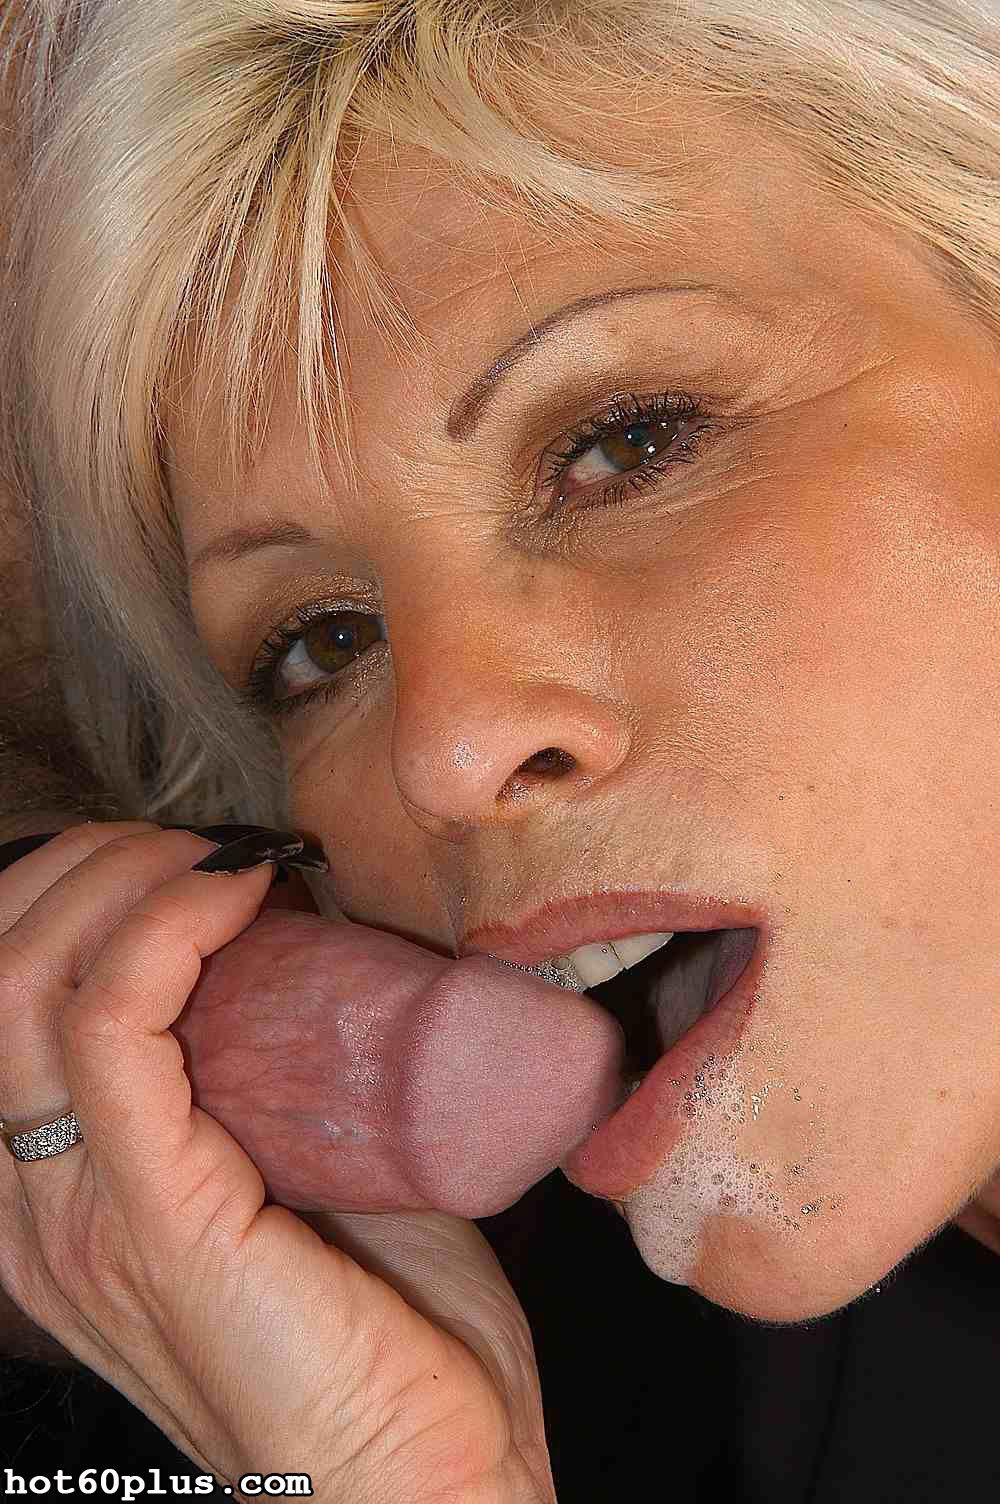 Eva - pierced pussy grandma